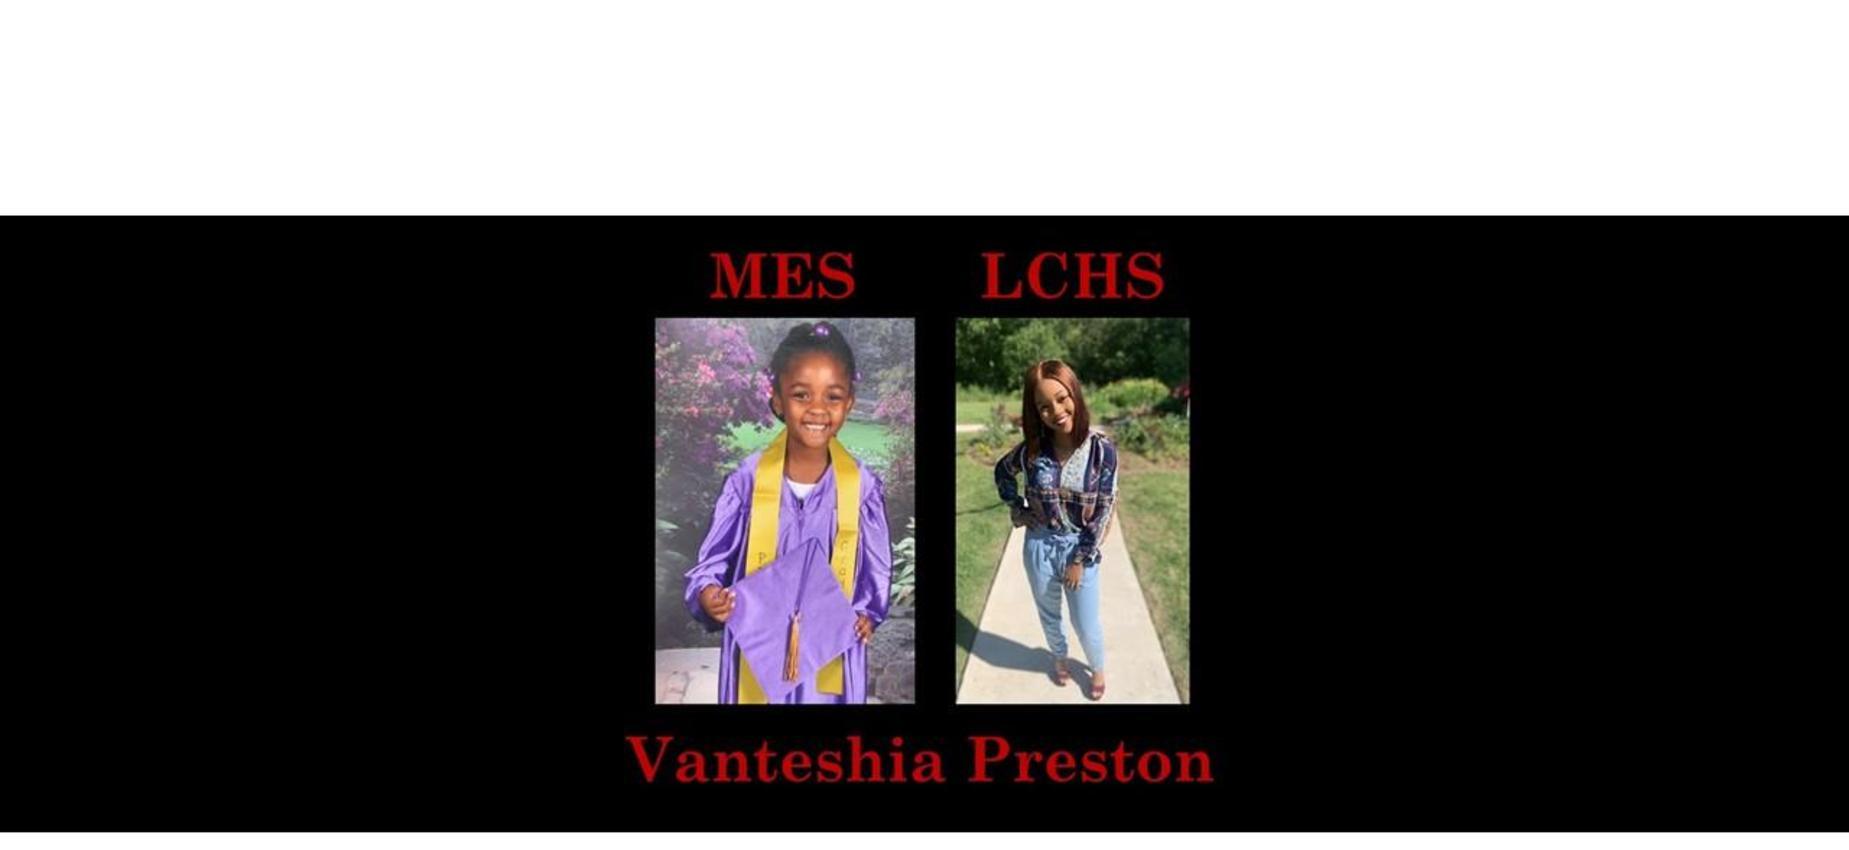 Vanteshia Preston K & 12th grade pics